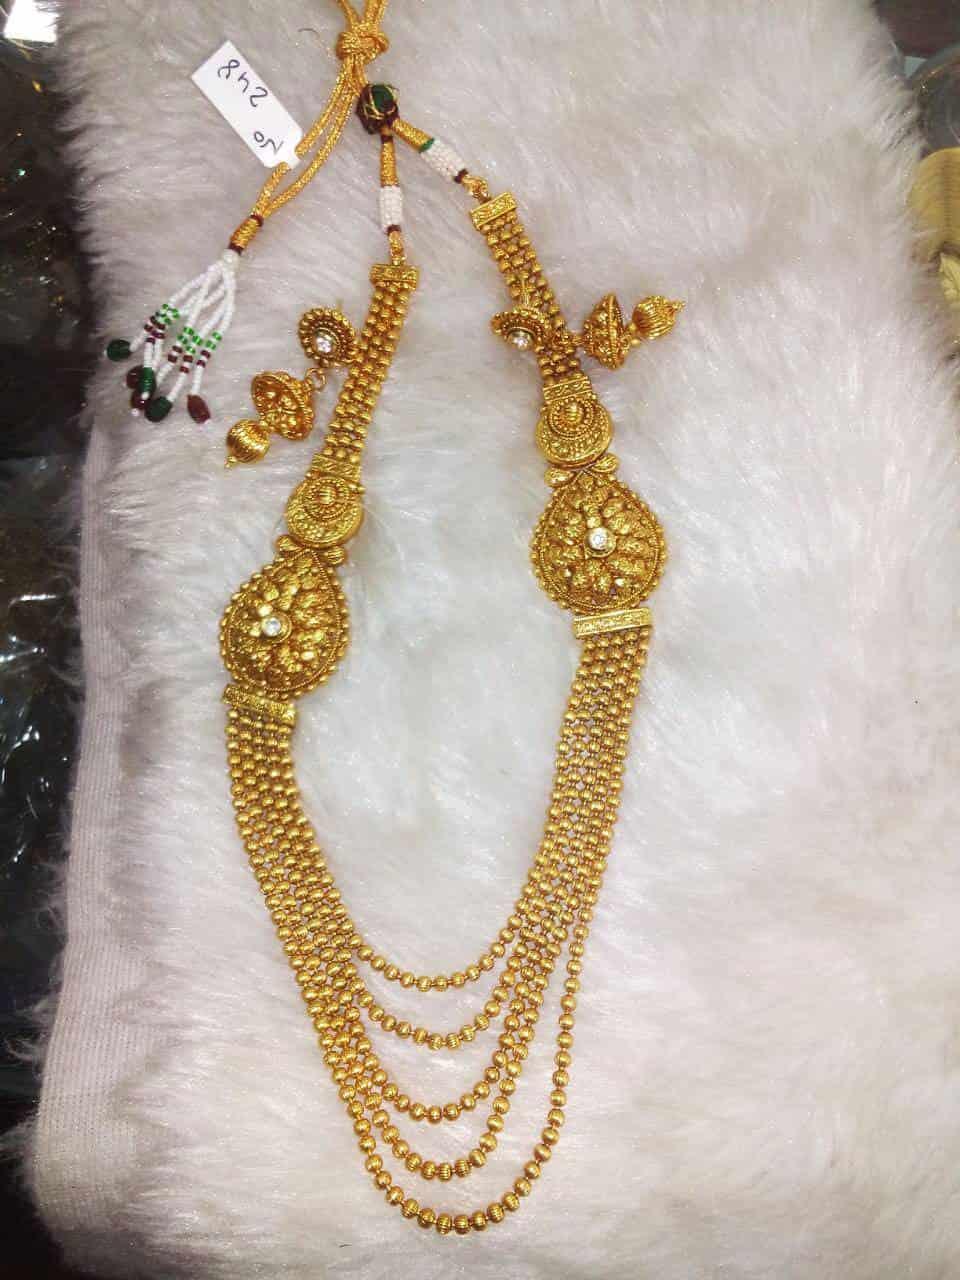 ea98e44949b44 New Shilpa Fashion Jewellery, Kalupur - Imitation Jewellery ...